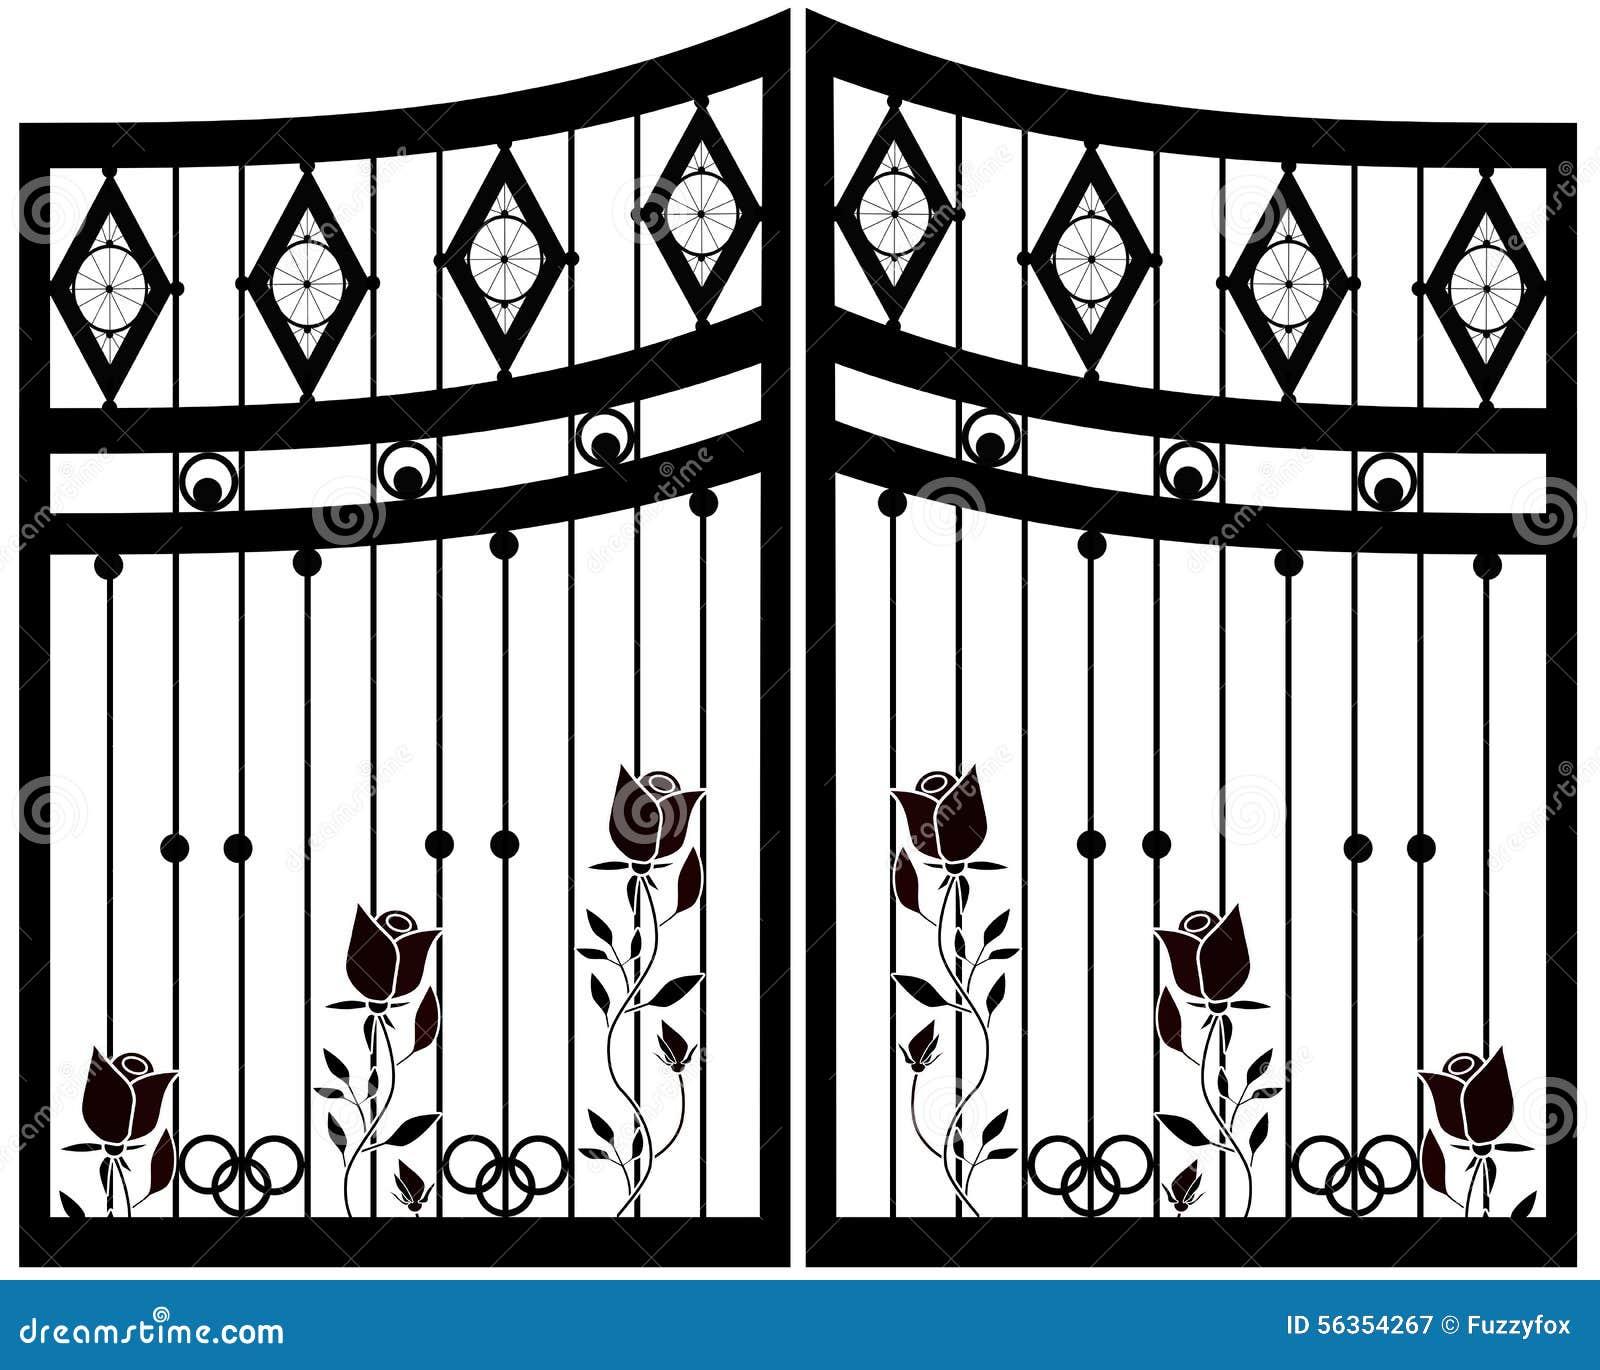 wallpaper iron fence - photo #24